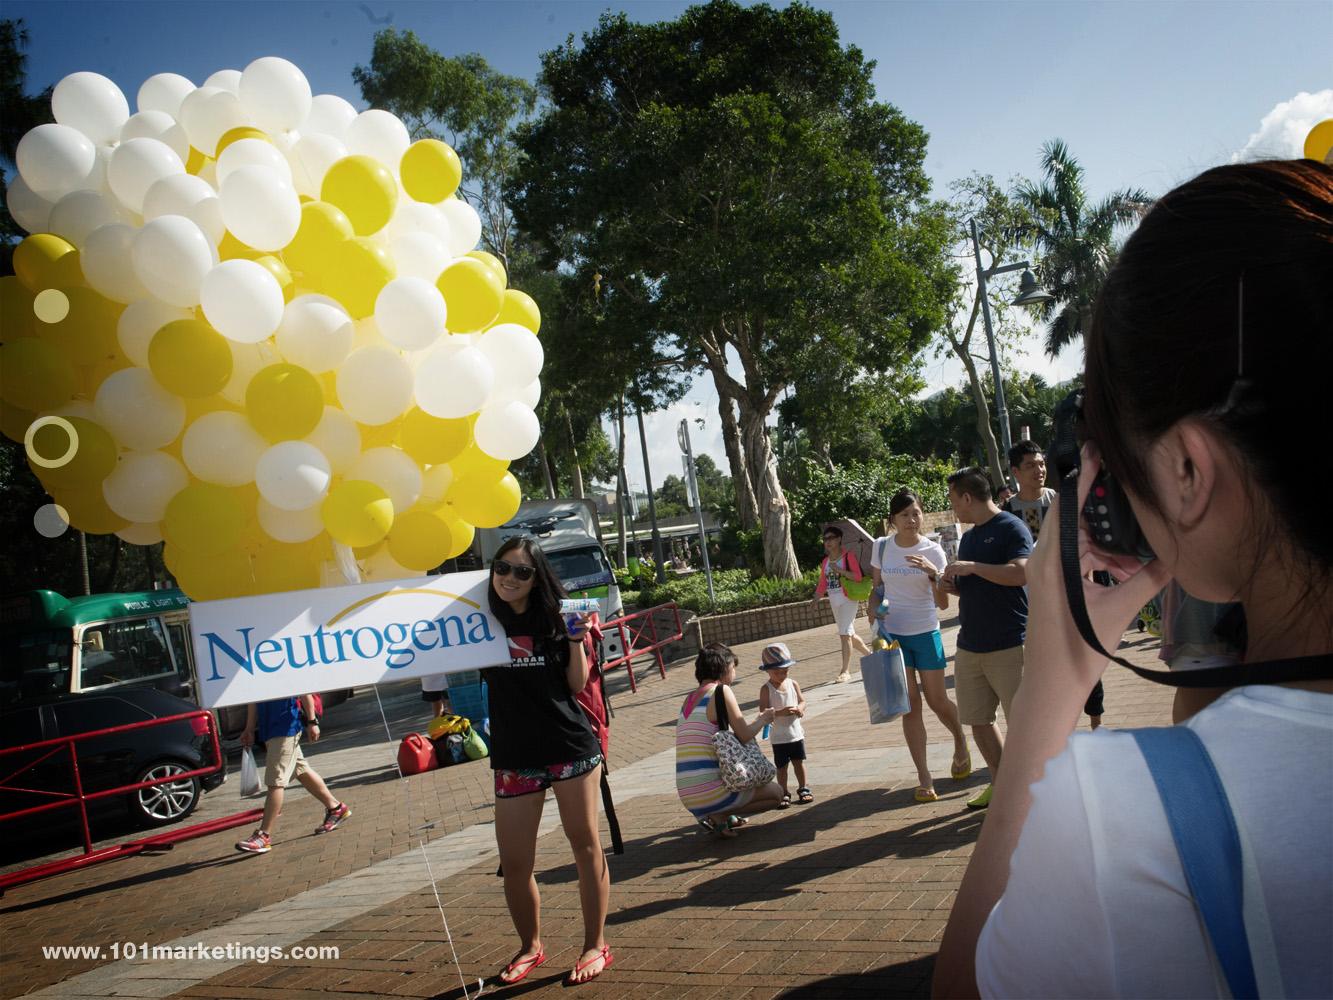 Neutrogena beach promotion